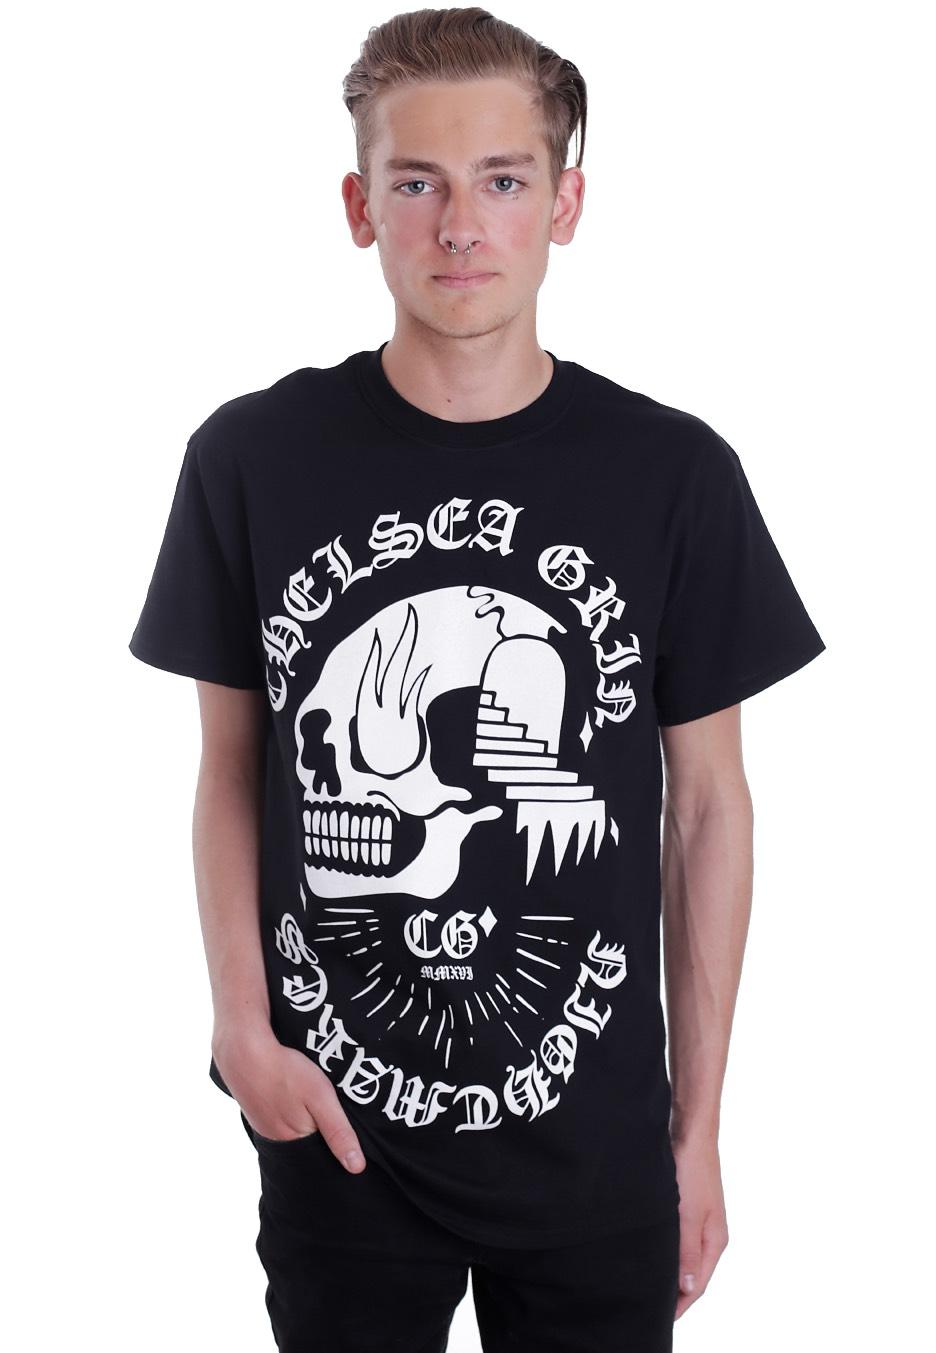 chelsea grin nightmares t shirt official deathcore merchandise shop worldwide. Black Bedroom Furniture Sets. Home Design Ideas